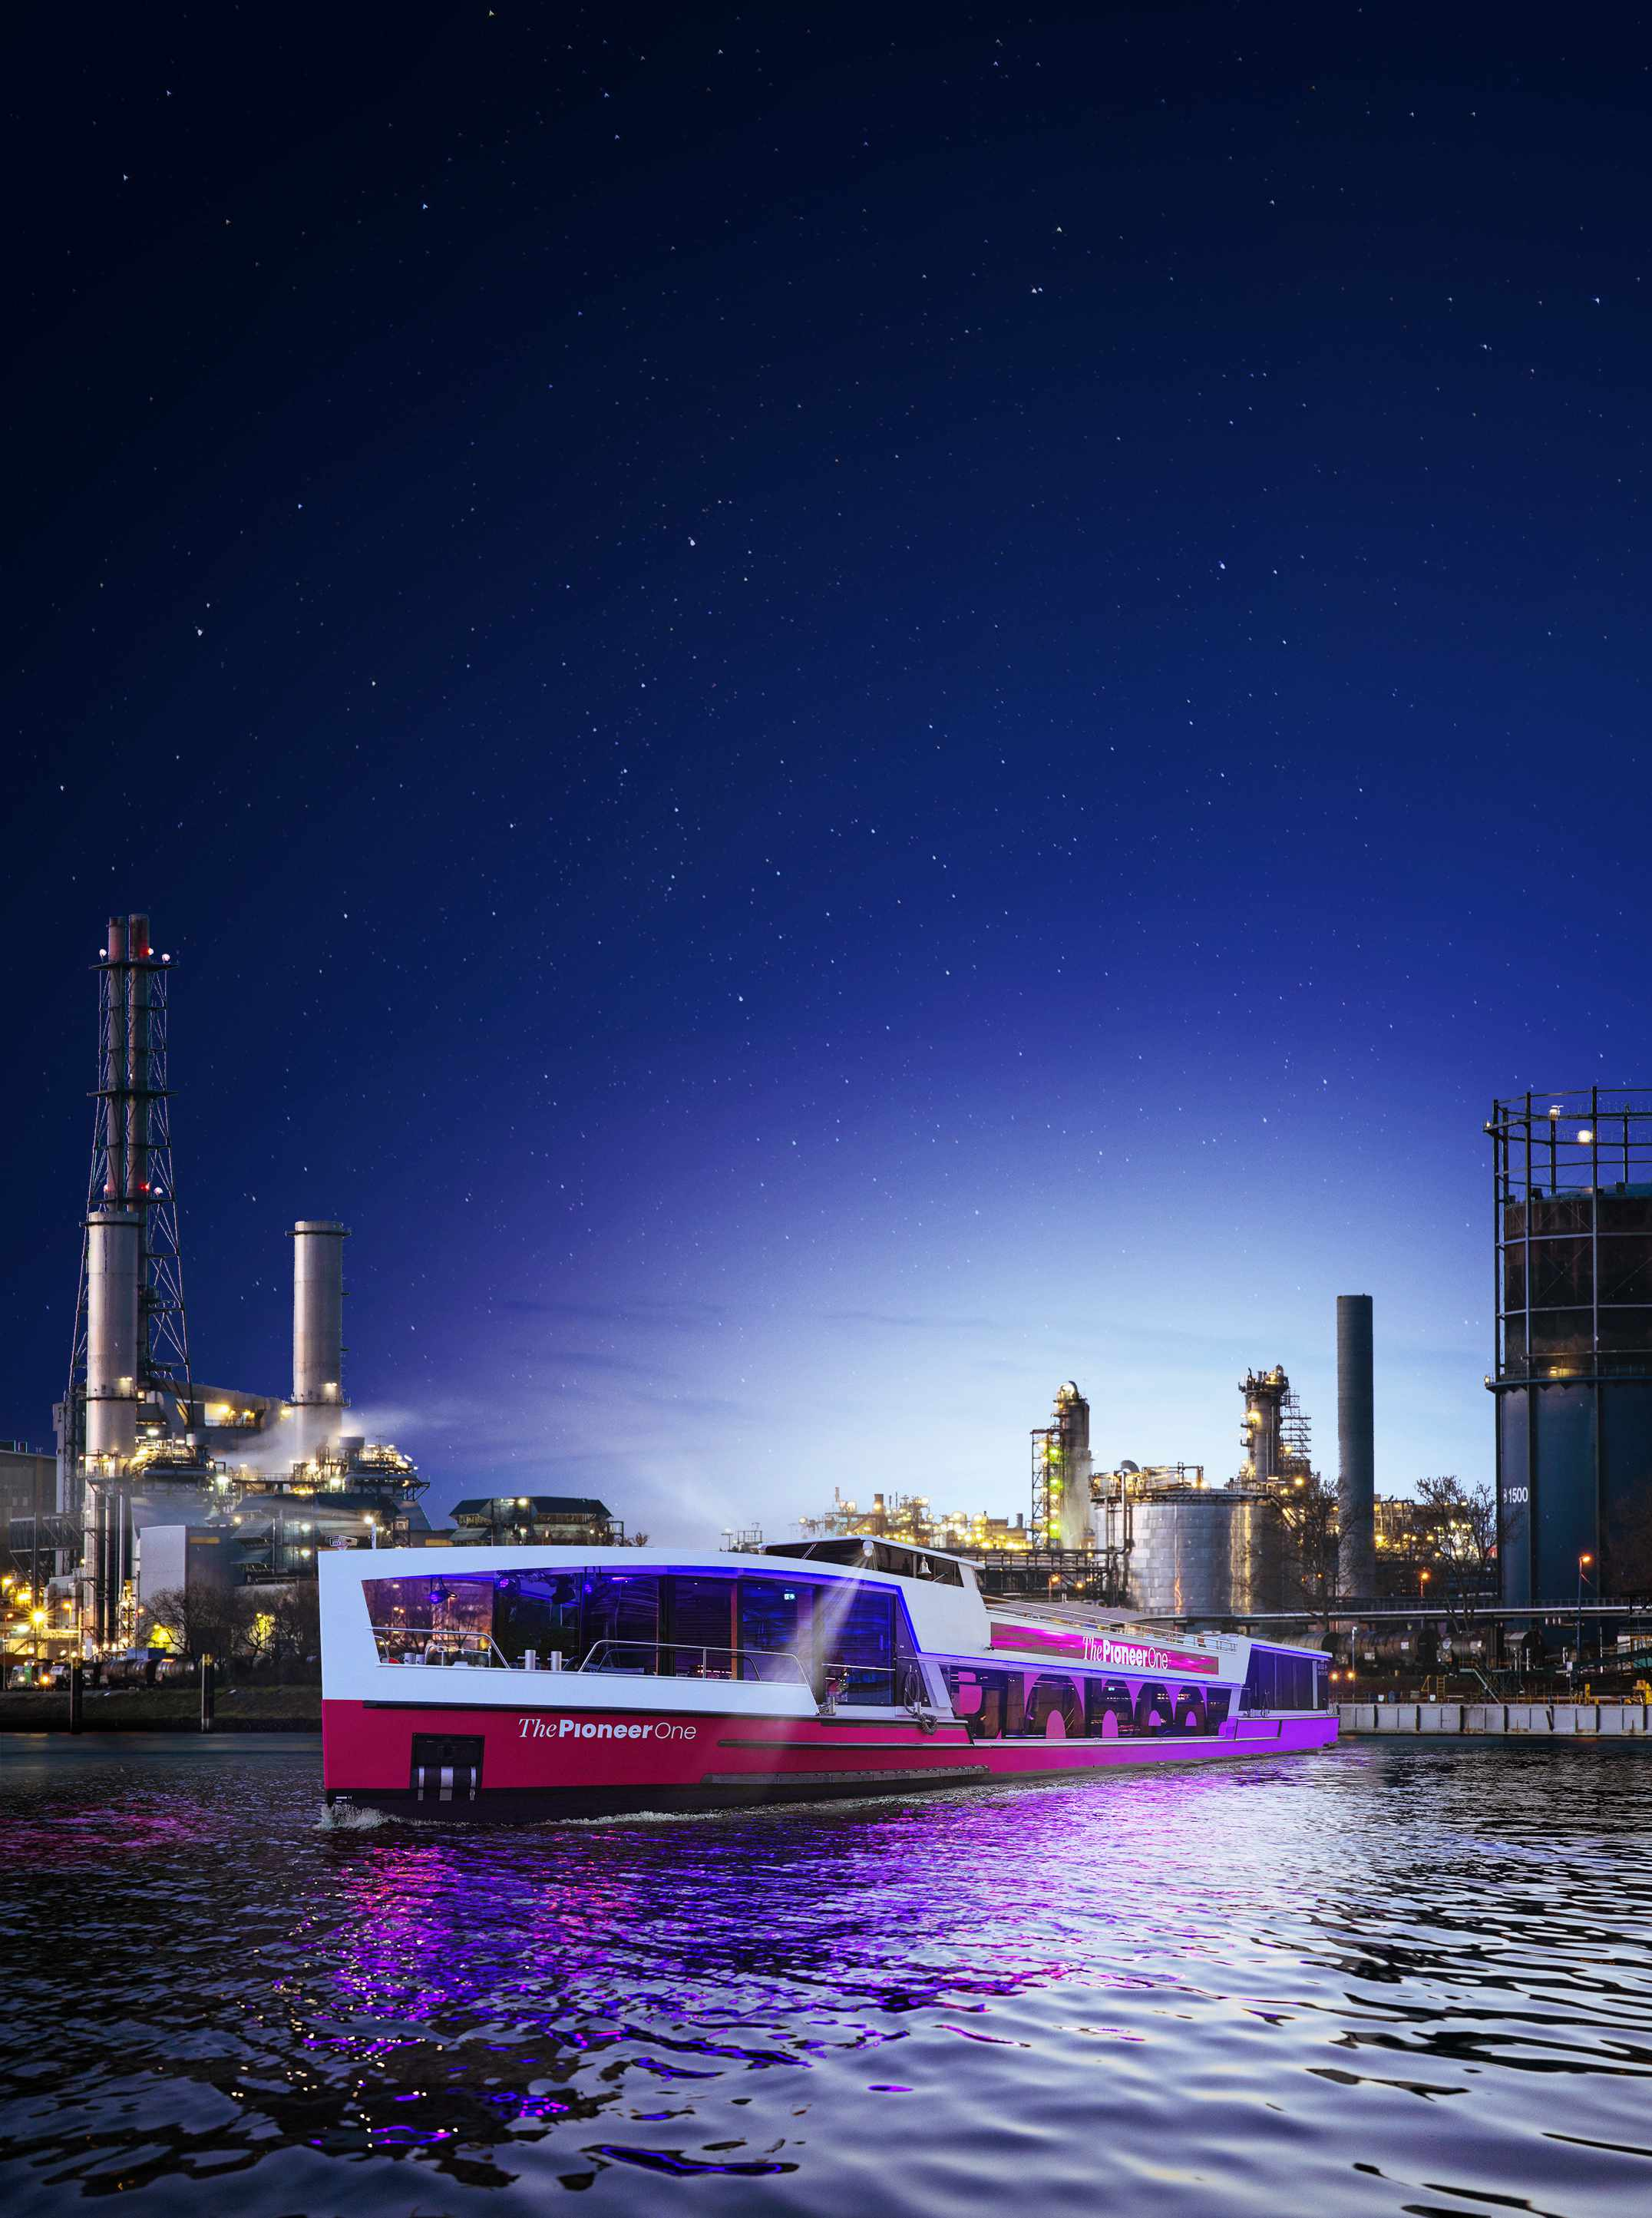 Medienschiff ThePioneerOne vor Skyline